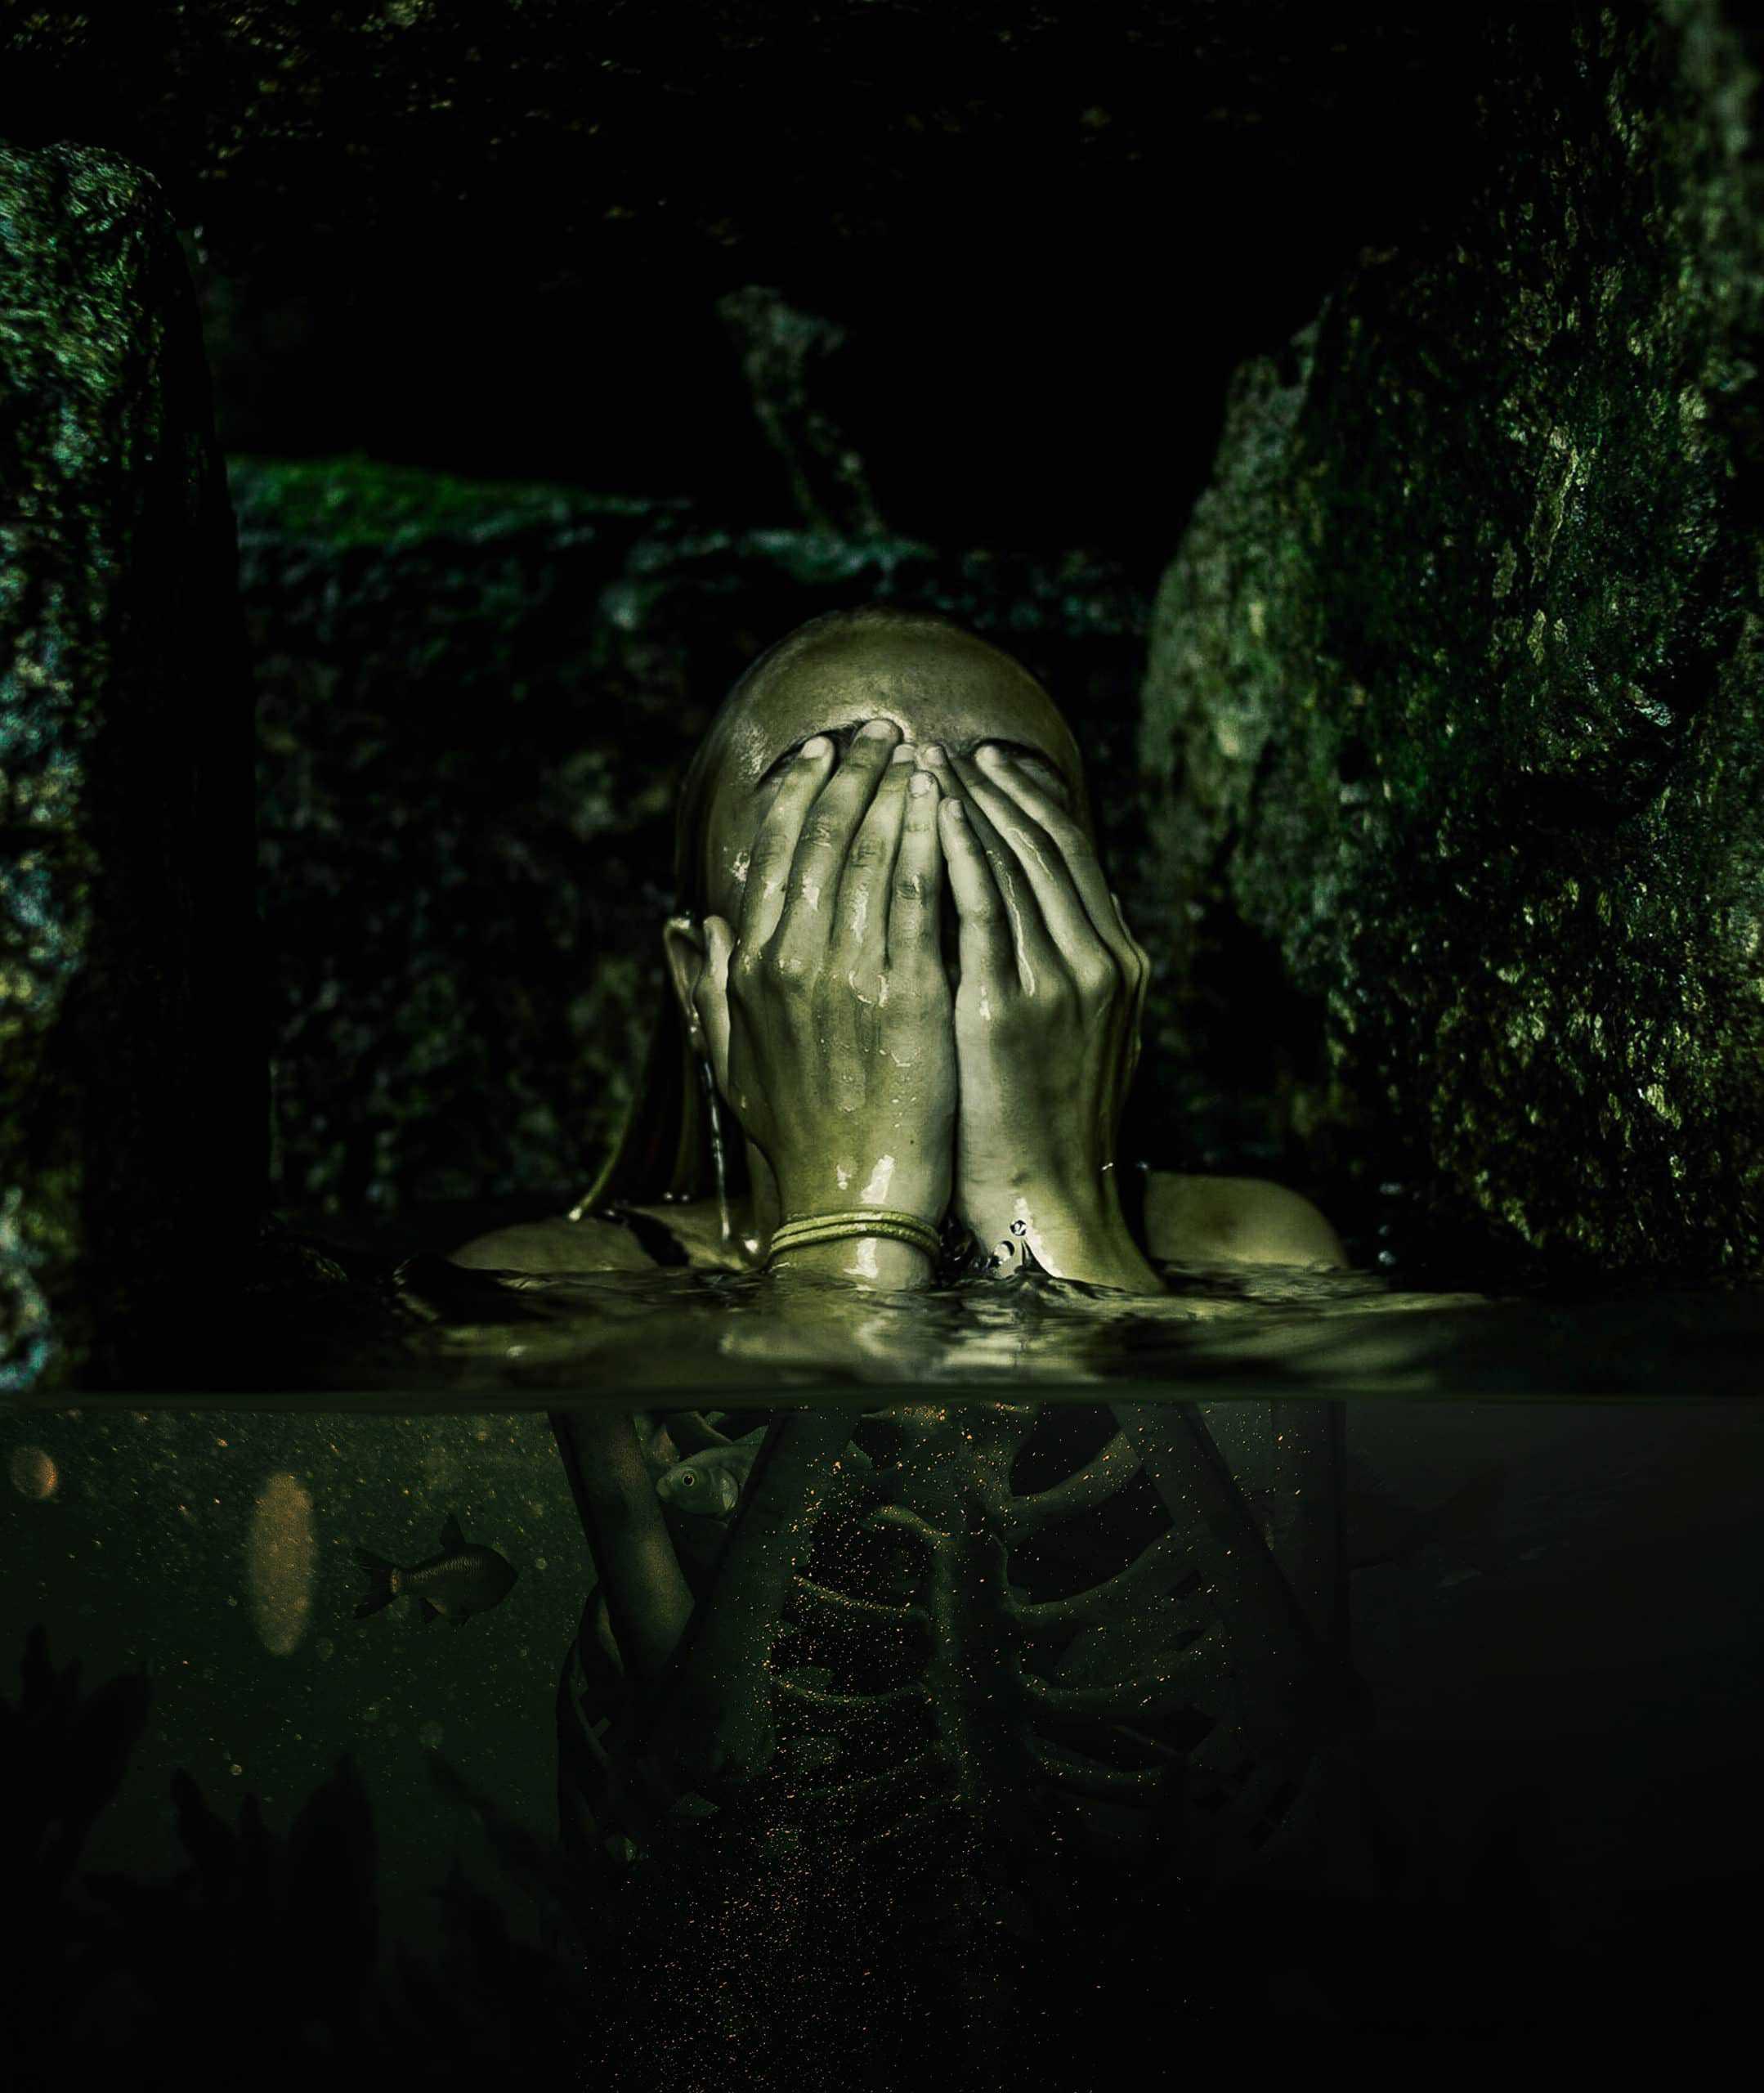 How to Create a Creepy Radioactive Water Scene in Photoshop